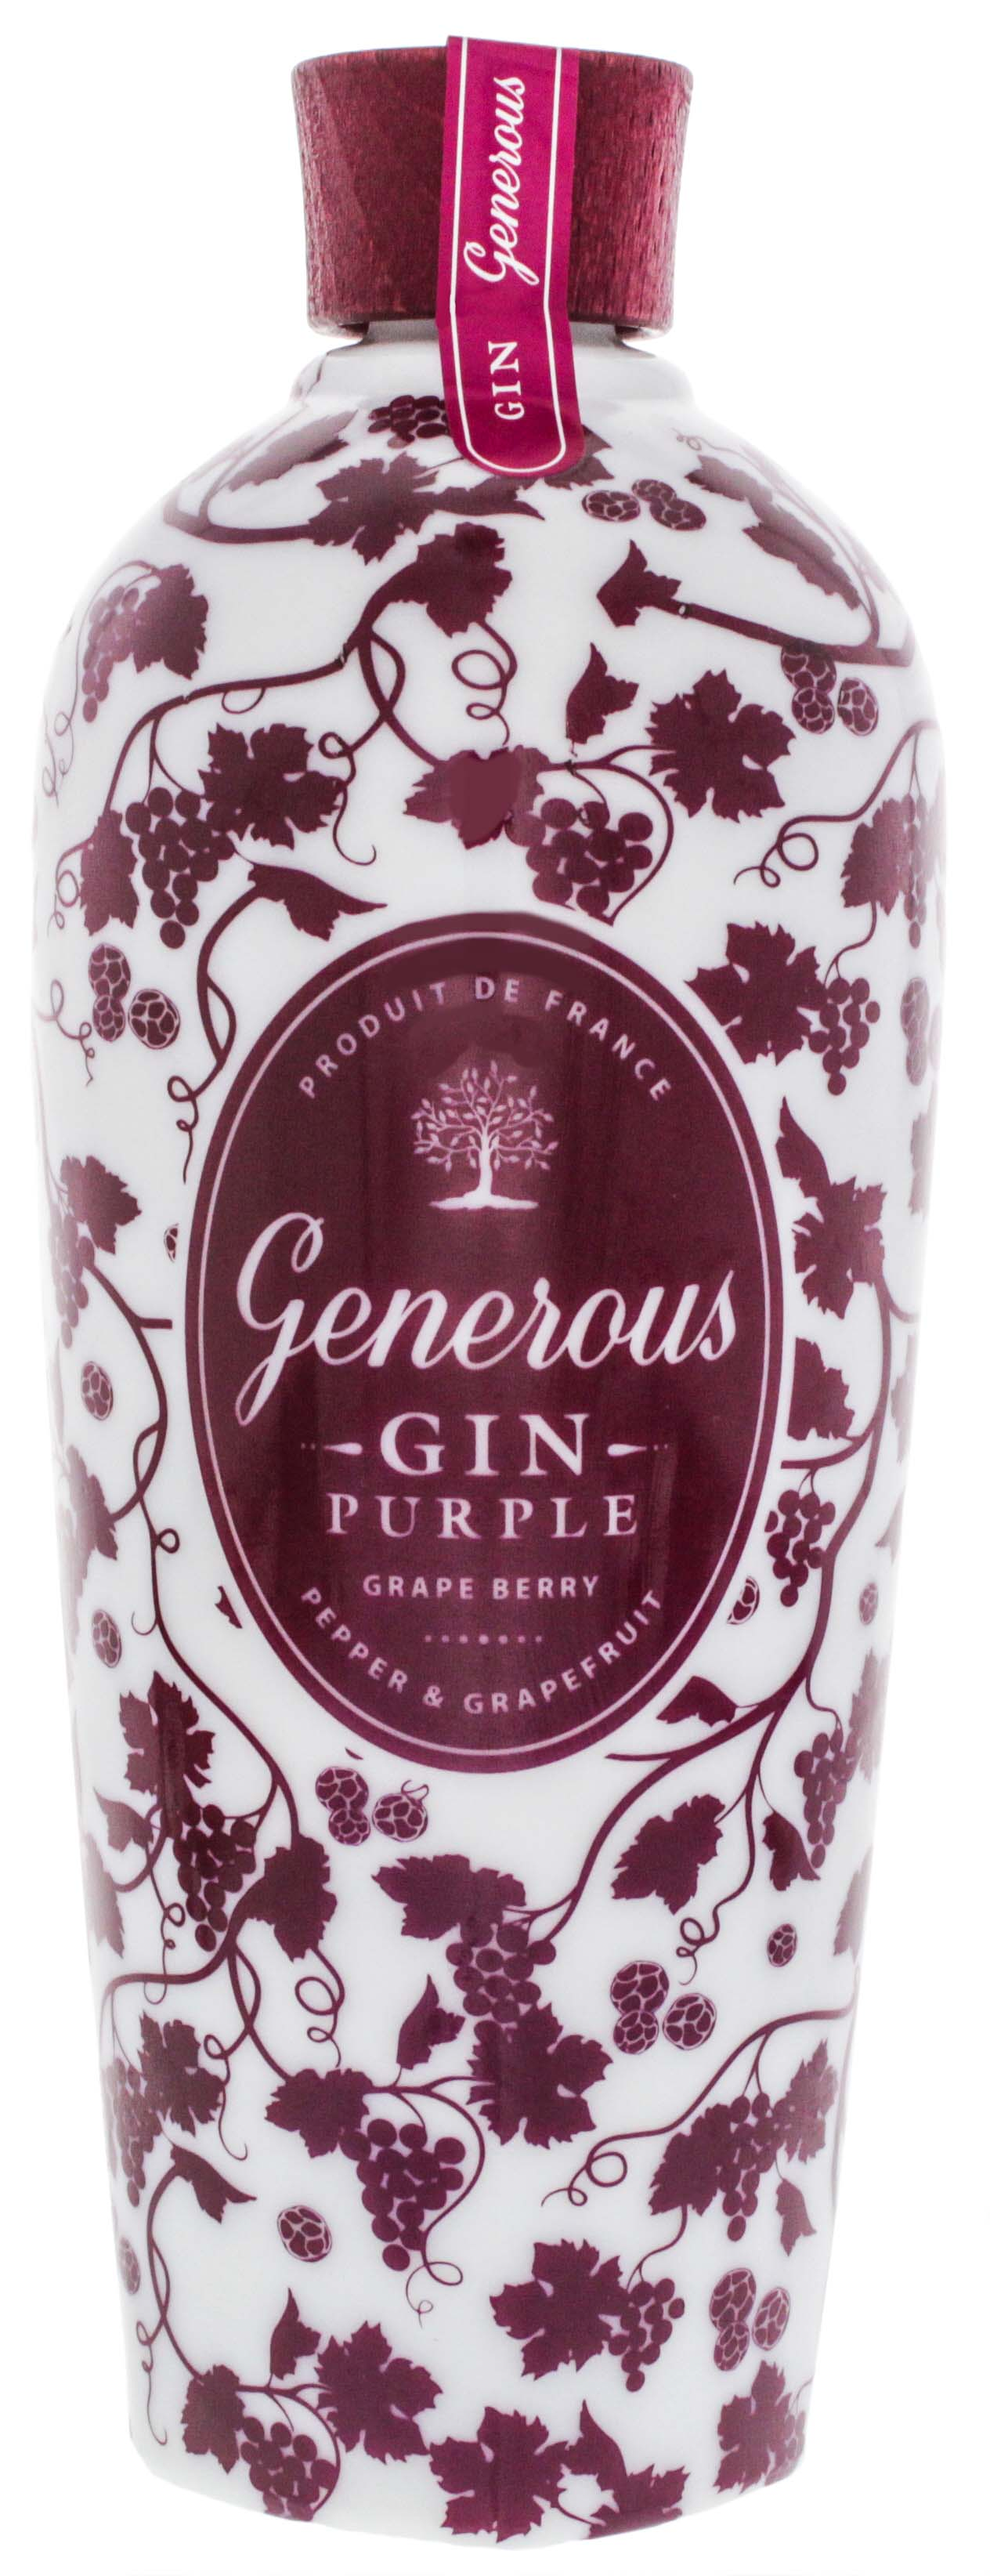 Generous Gin Purple 0,7L